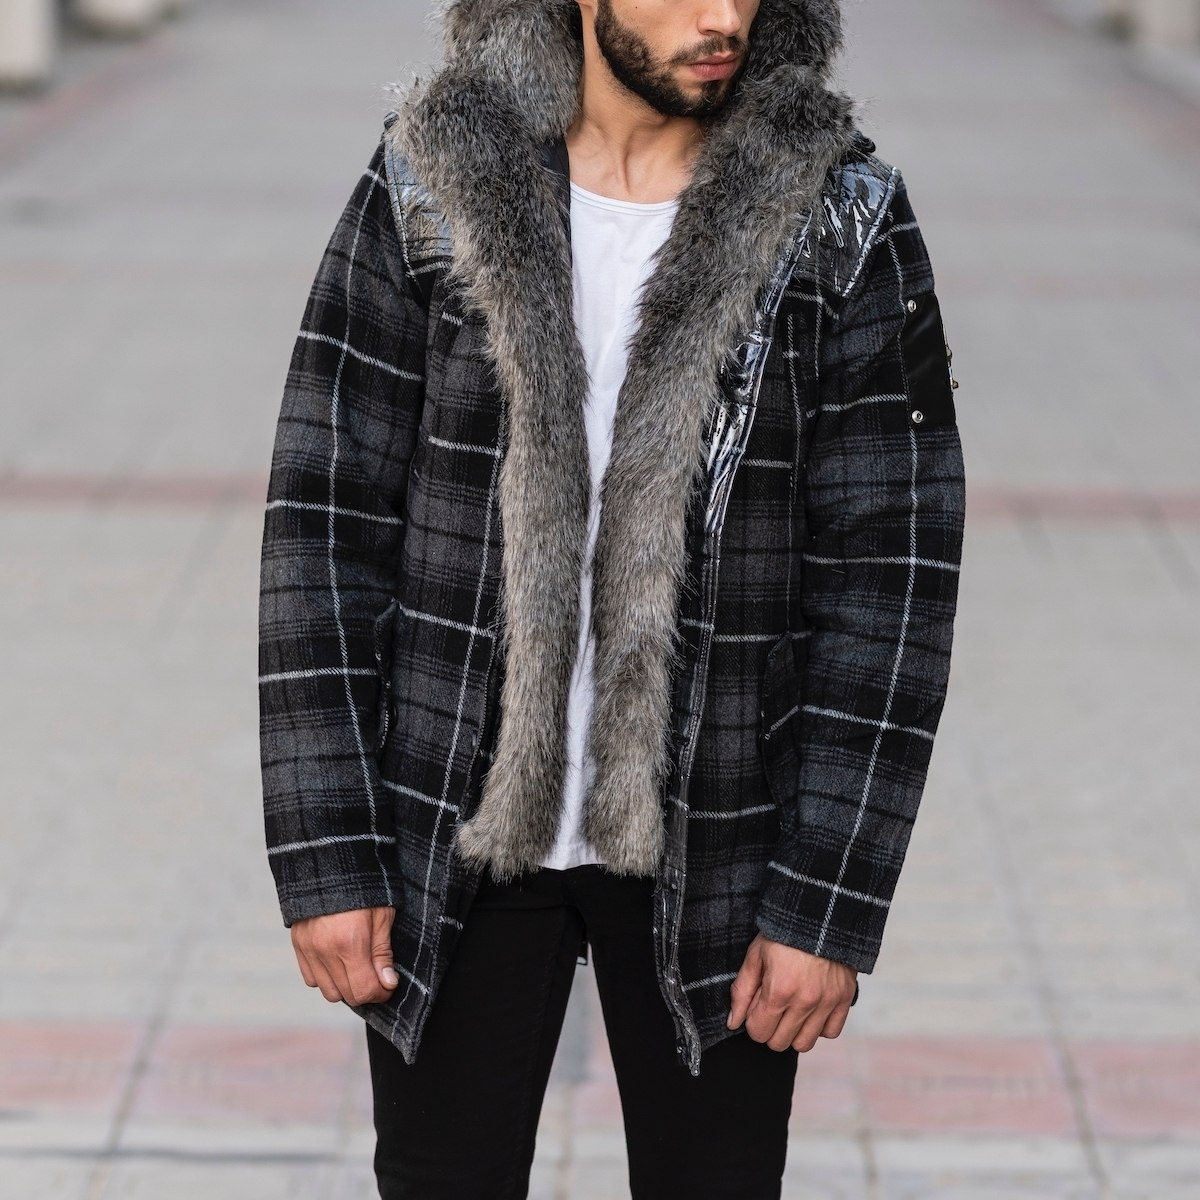 Furry Plaid Jacket With Hood MV Jacket Collection - 1